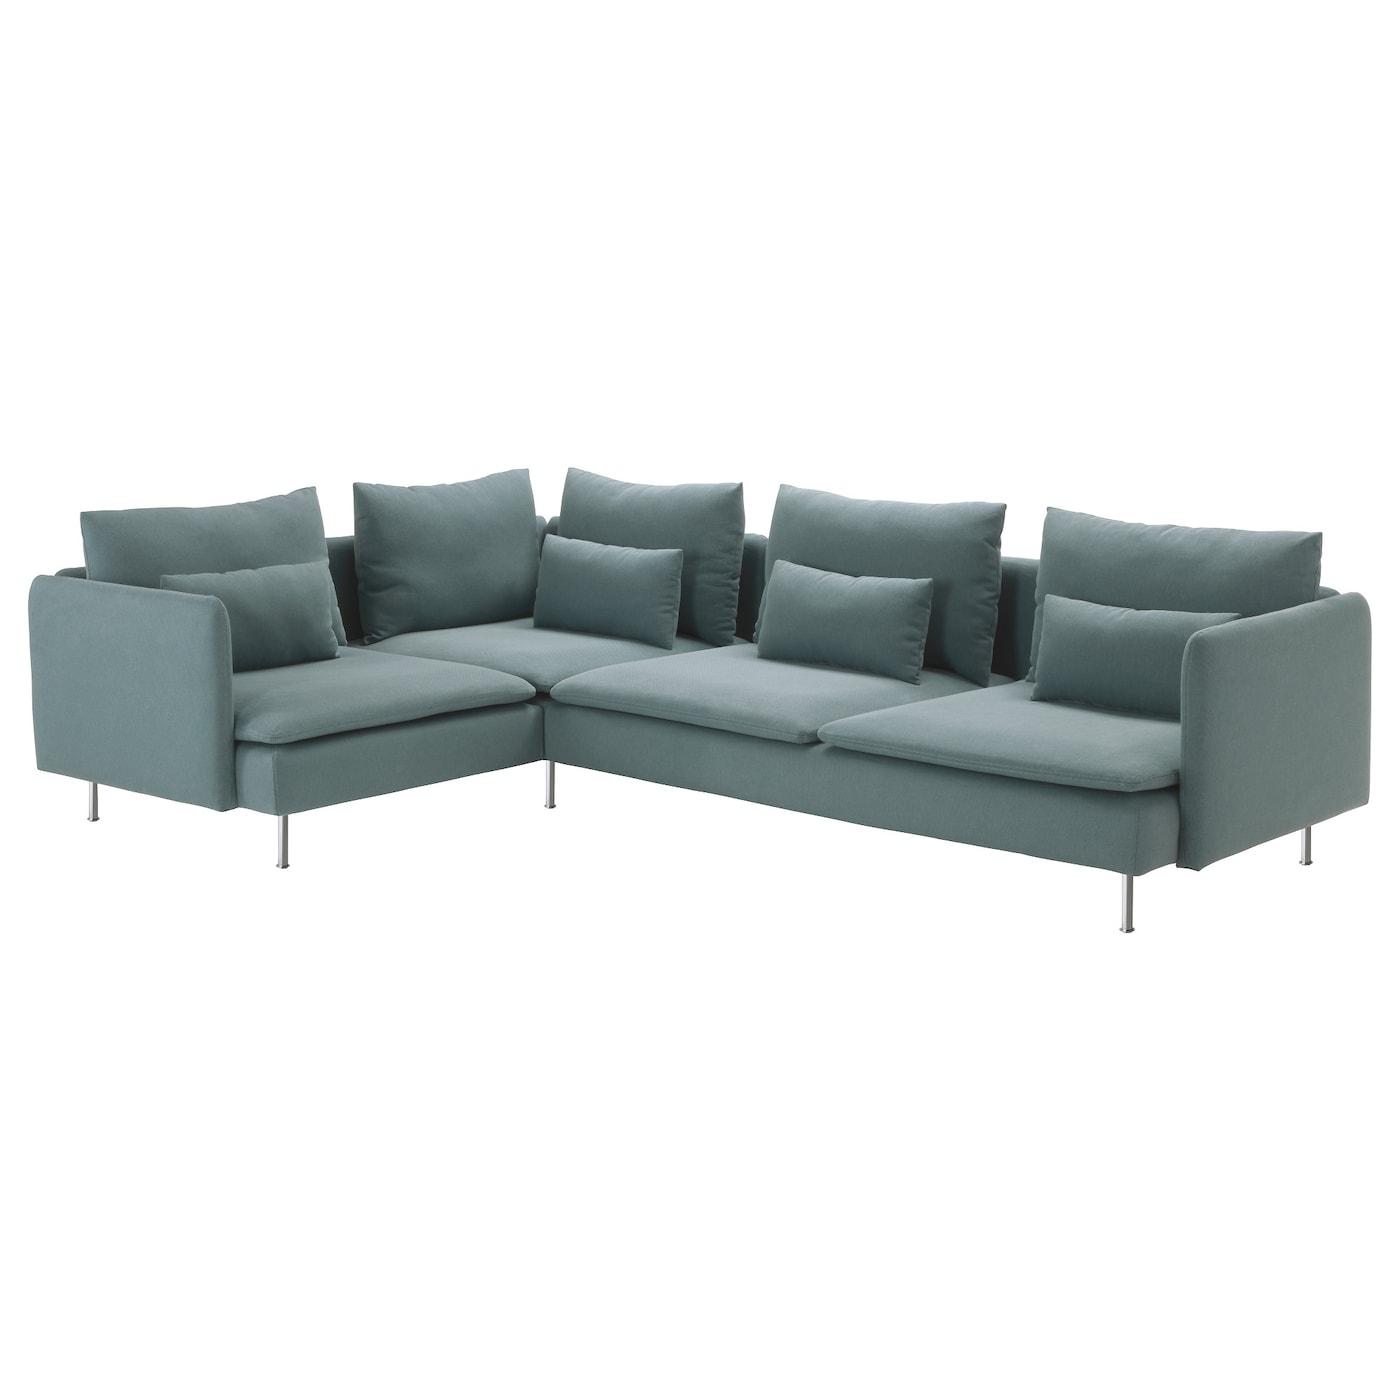 IKEA SÖDERHAMN Corner Sofa 2+1 10 Year Guarantee. Read About The Terms In